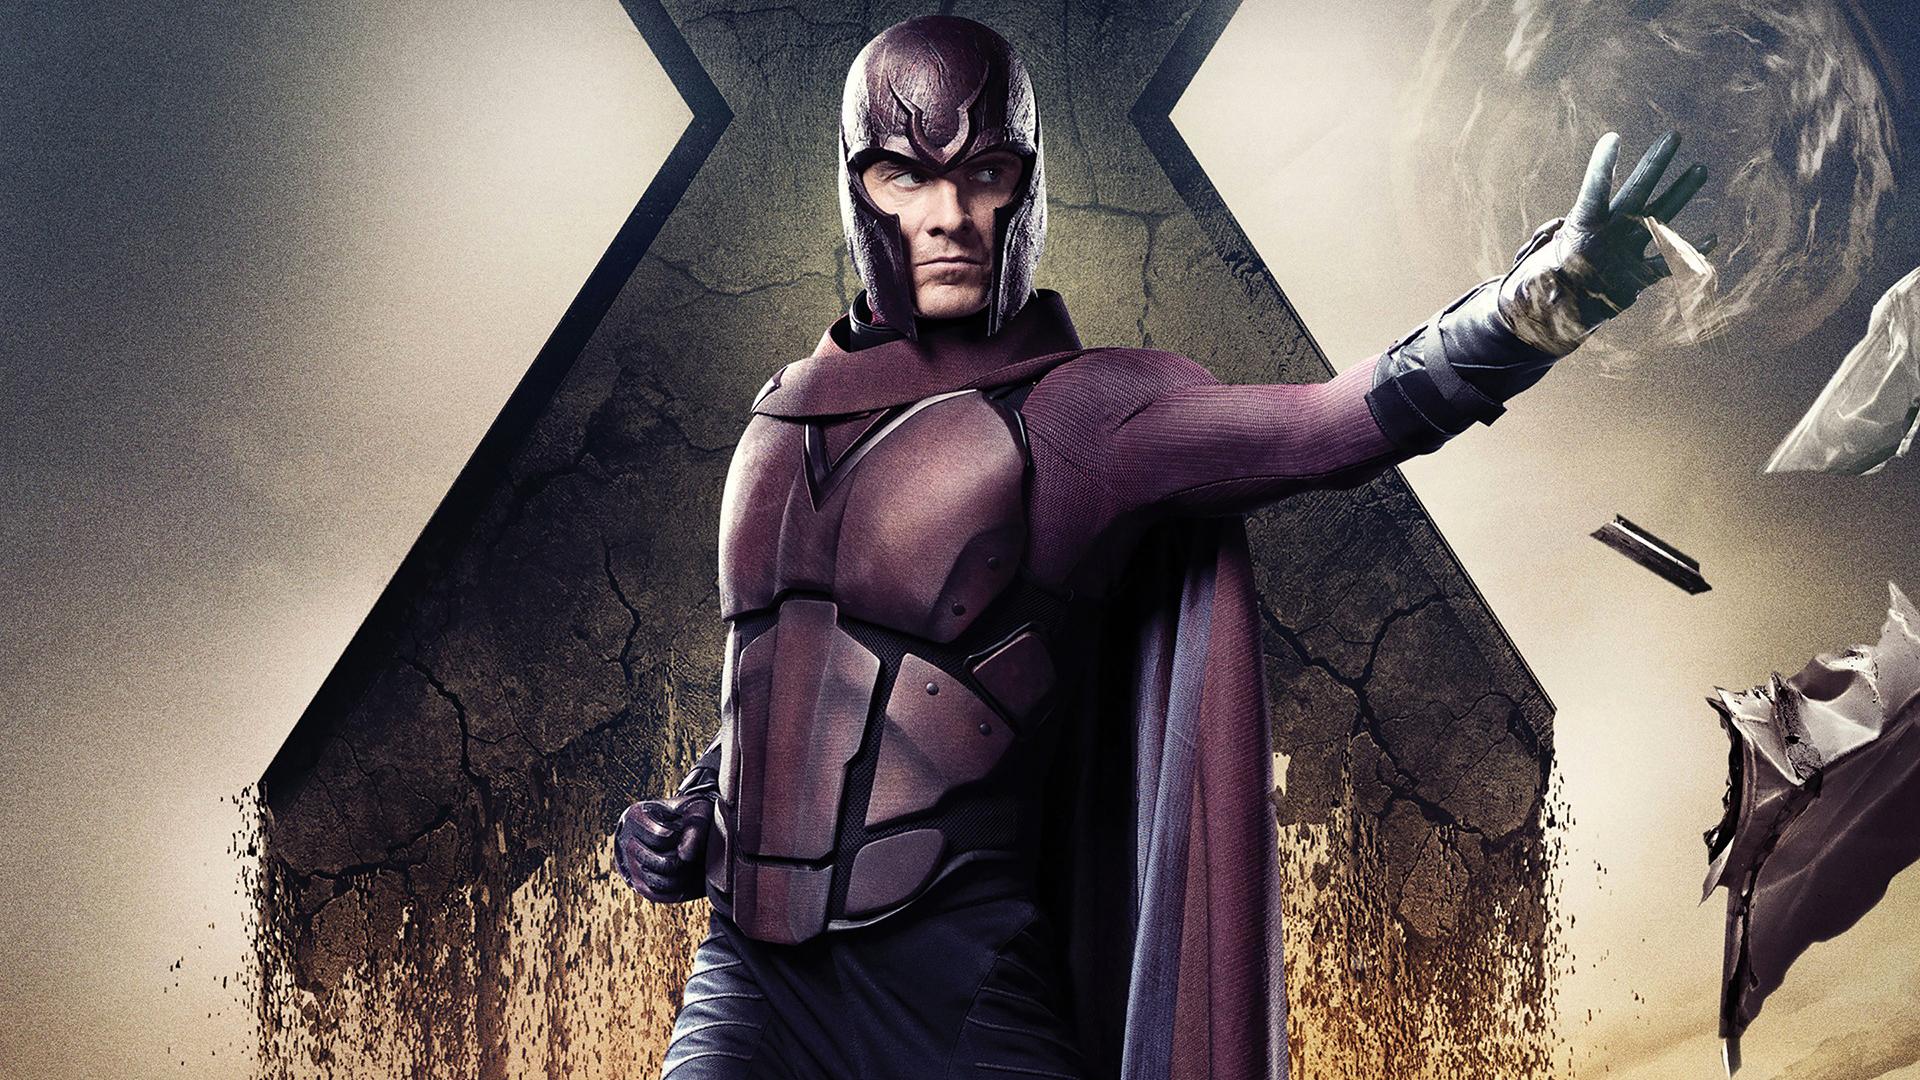 Magneto Days of Future Past Wallpaper HD